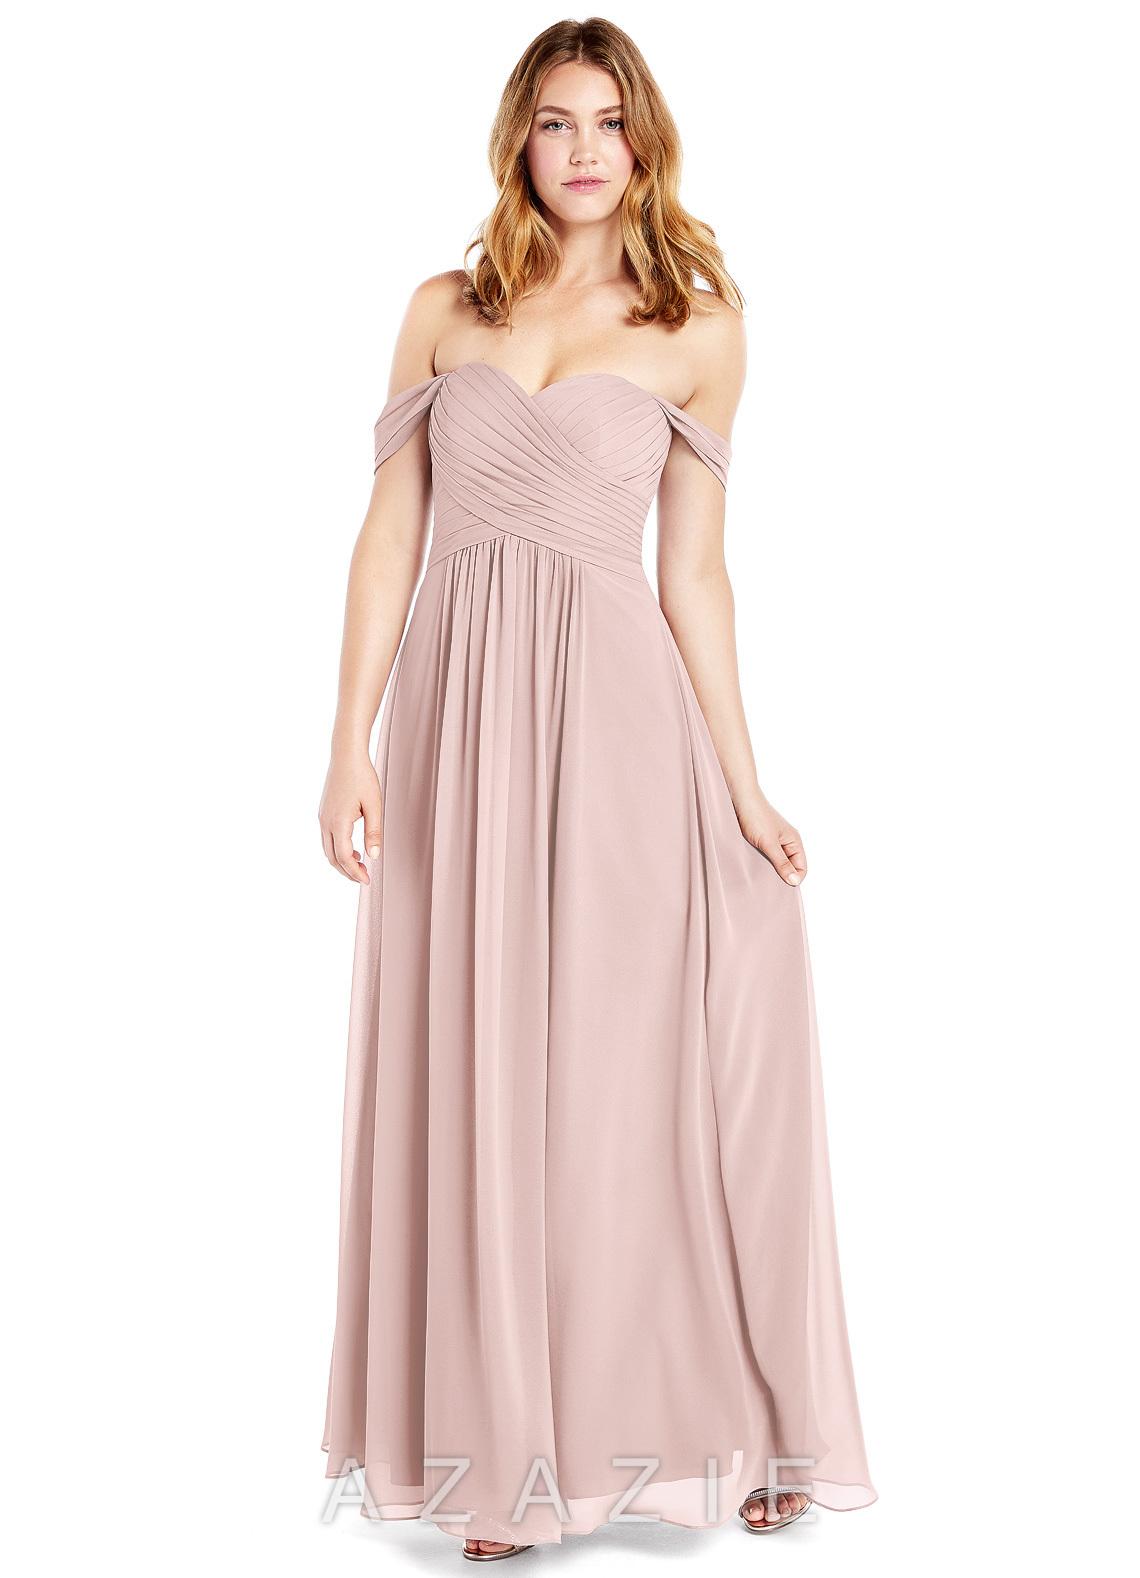 962ebcd23aaa Azazie Corin Bridesmaid Dress   Azazie